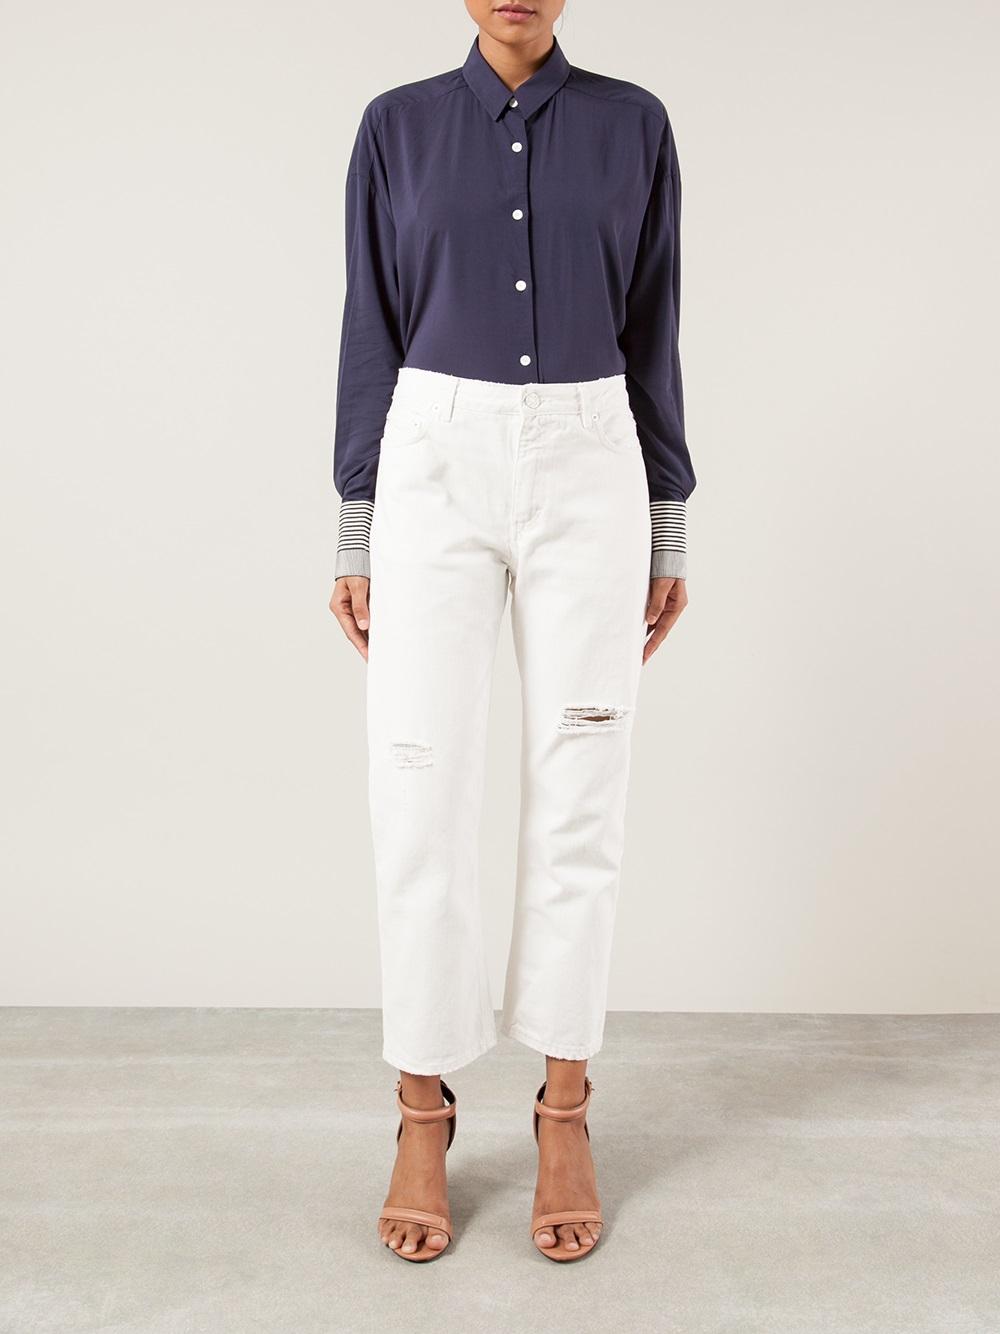 Acne Boyfriend Jeans in White | Lyst